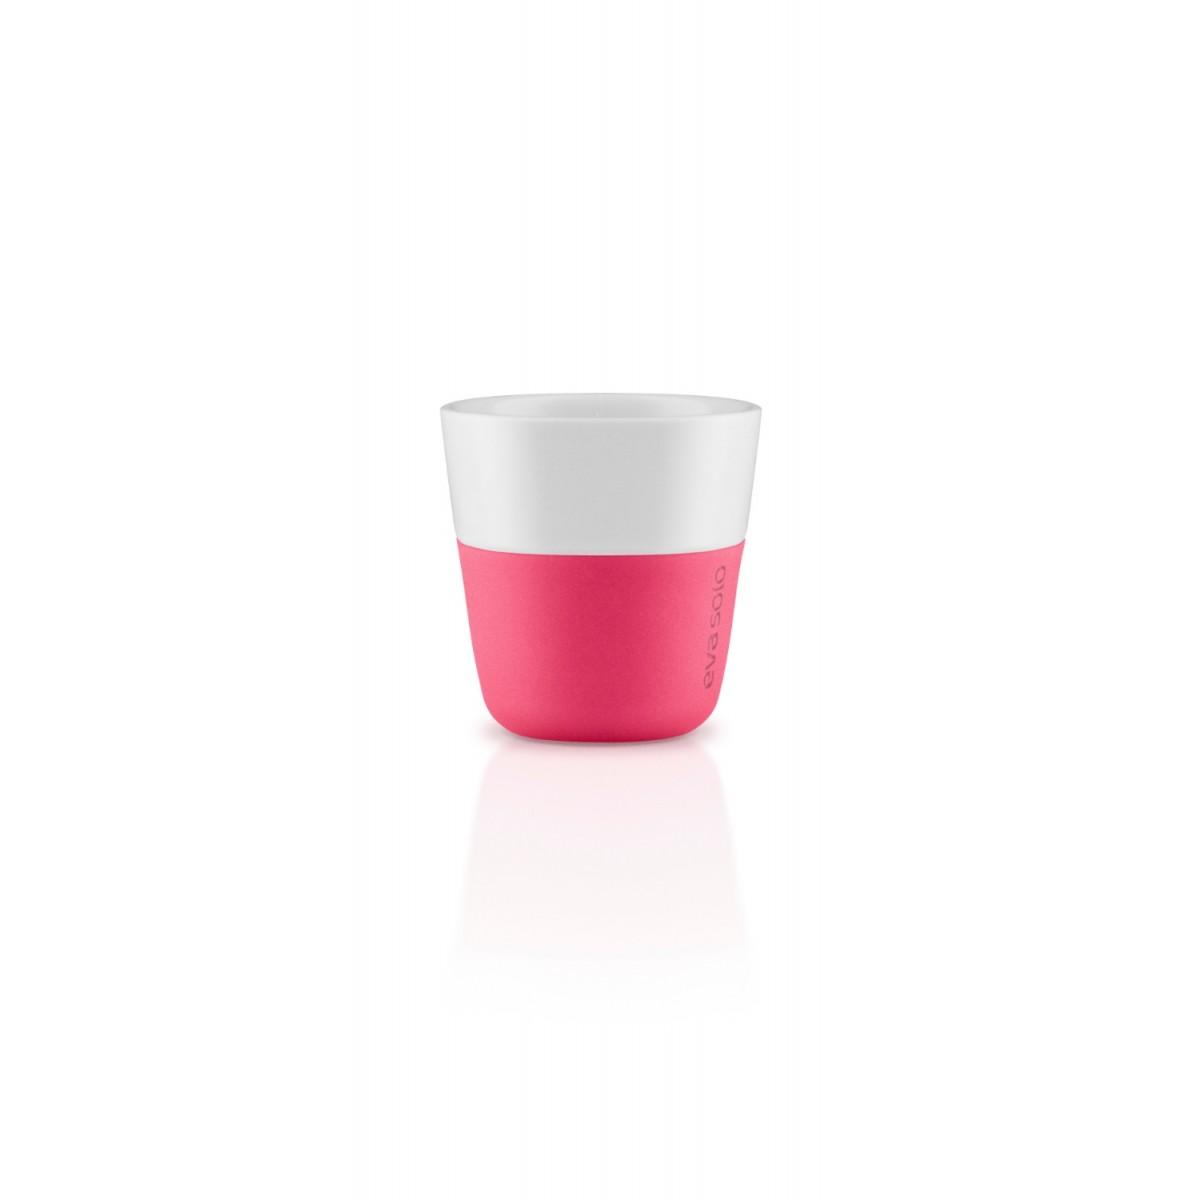 EVA SOLO Espresso-krus berry - 2 stk